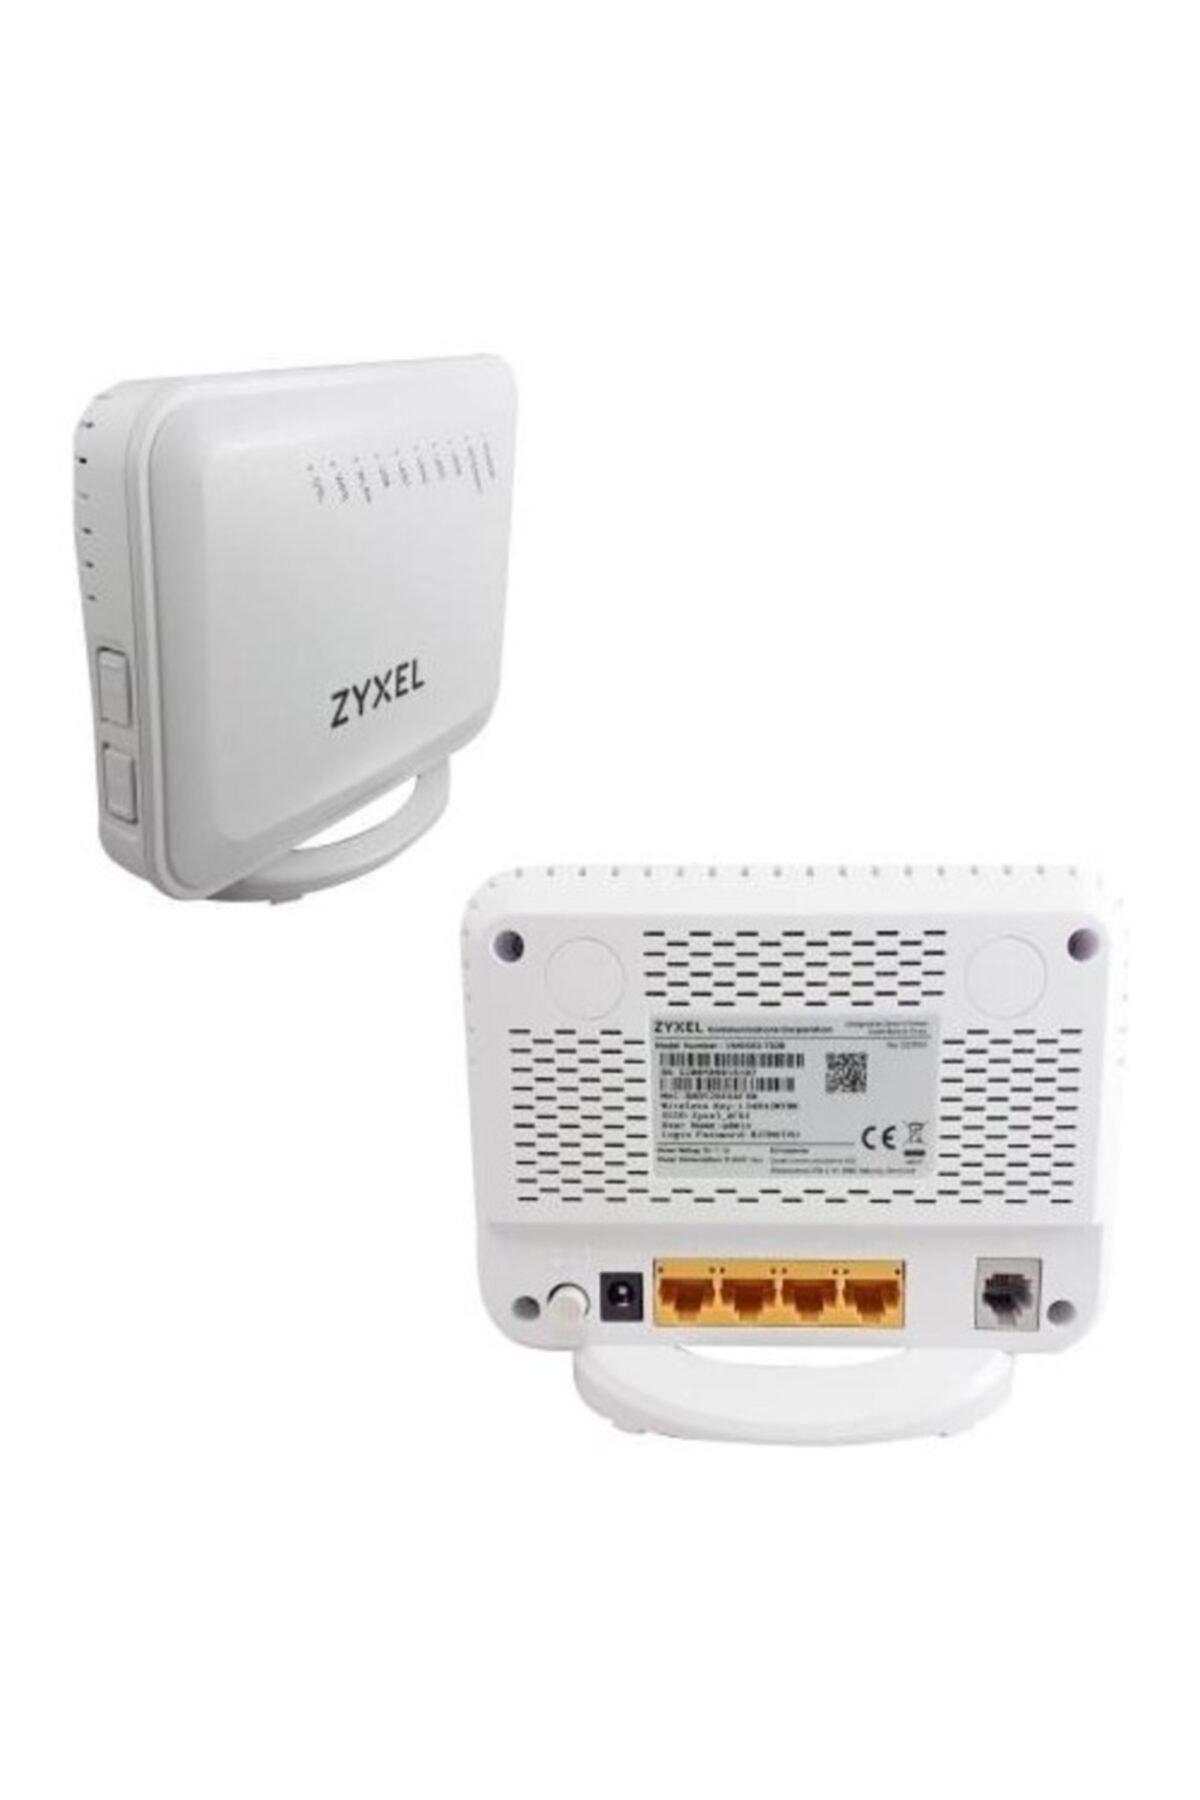 ZyXEL VMG1312-T20B VDSL/ADSL 300Mbps Kablosuz 4-Port Modem 2